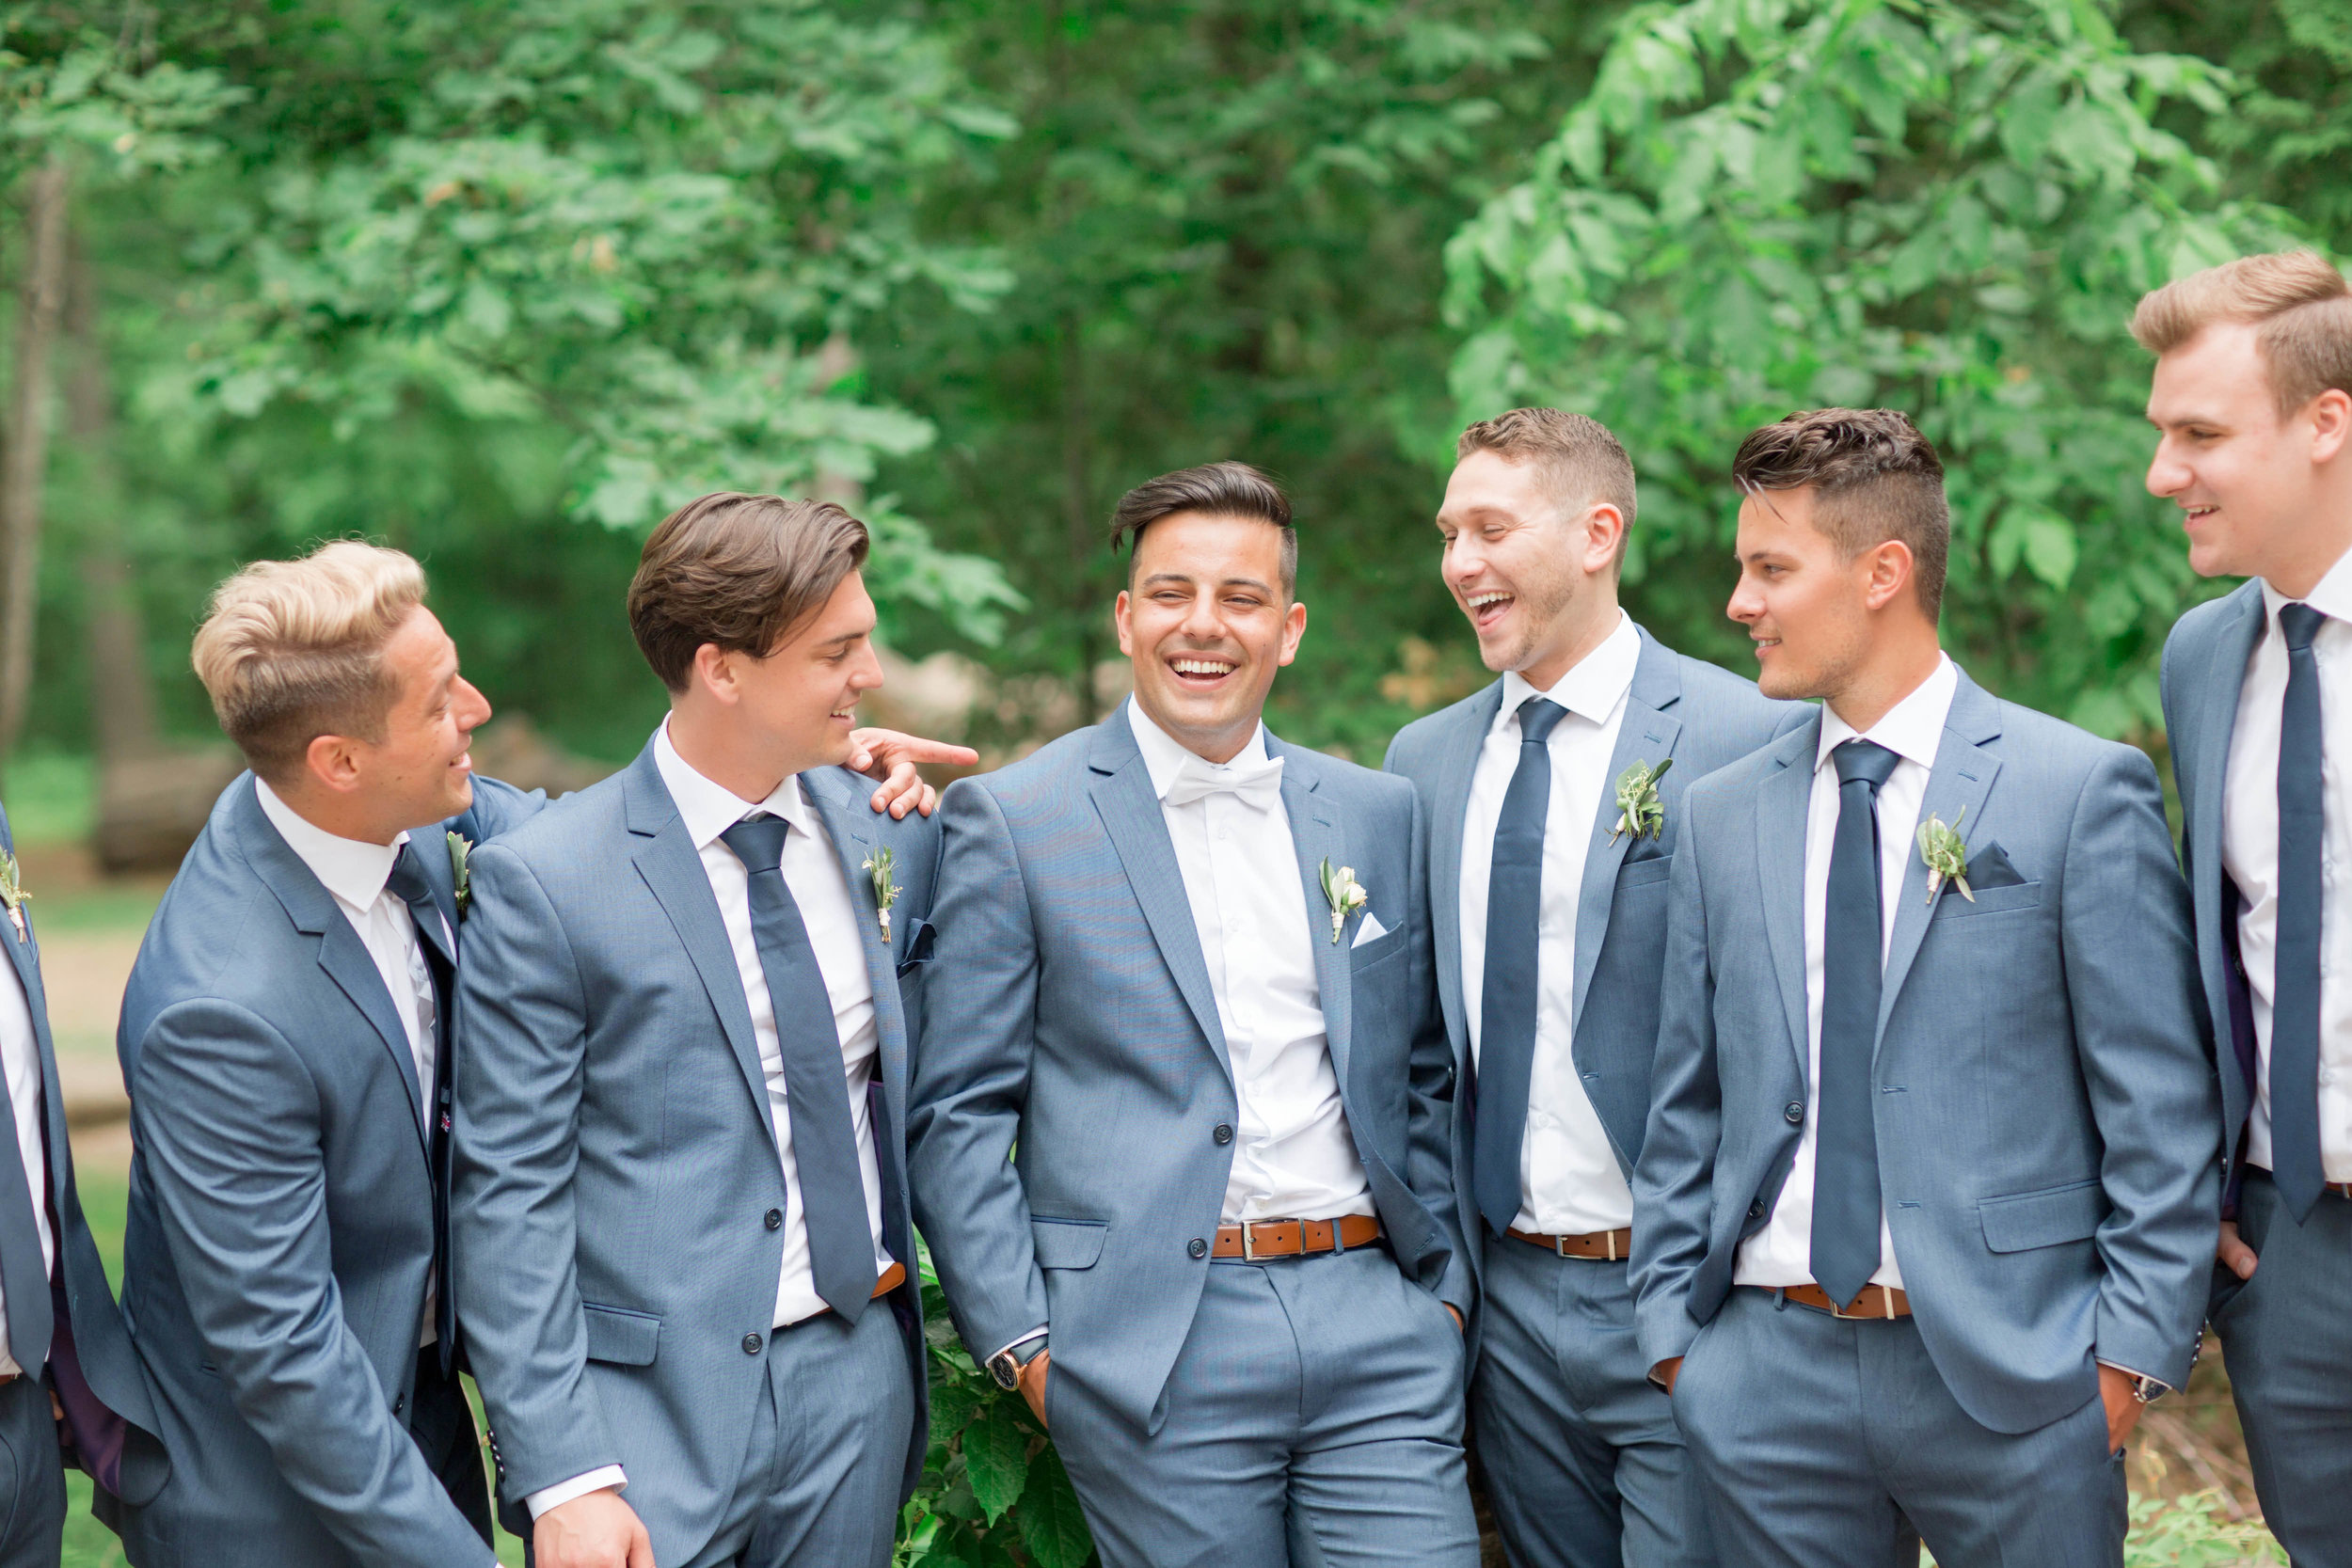 Miranda___Daniel___Daniel_Ricci_Weddings___High_Res._Finals_132.jpg